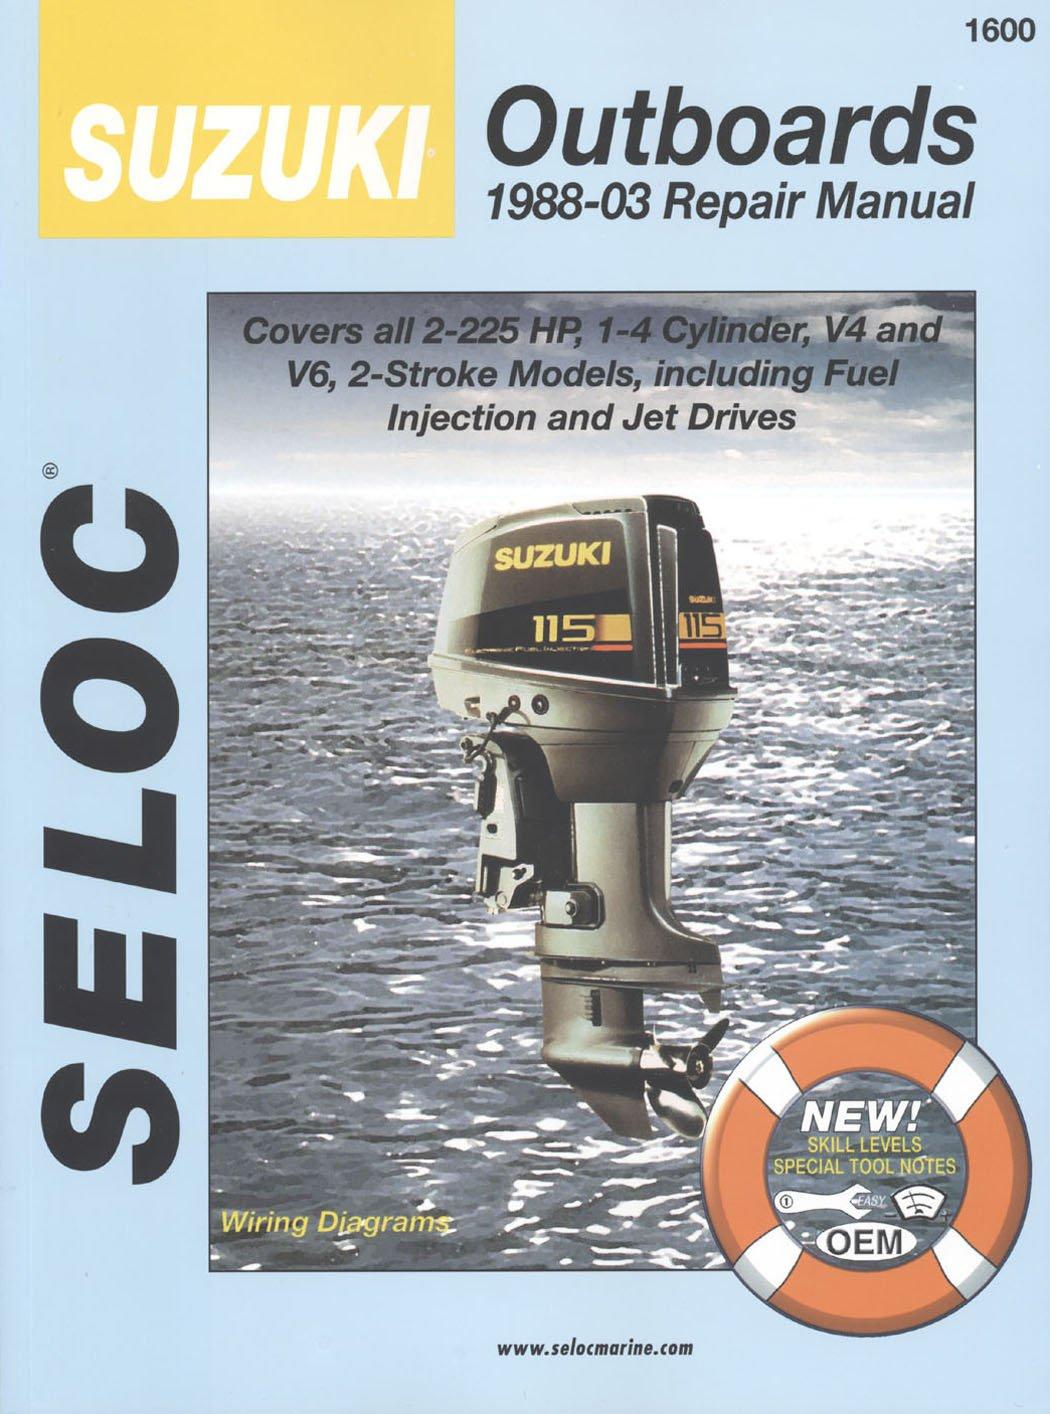 Amazon.com : Sierra International Seloc Manual 18-01600 Suzuki Outboards  Repair 1988-2003 2-225 HP 1-4 Cylinder V4 & V6 2 Stroke Model Including  Fuel ...